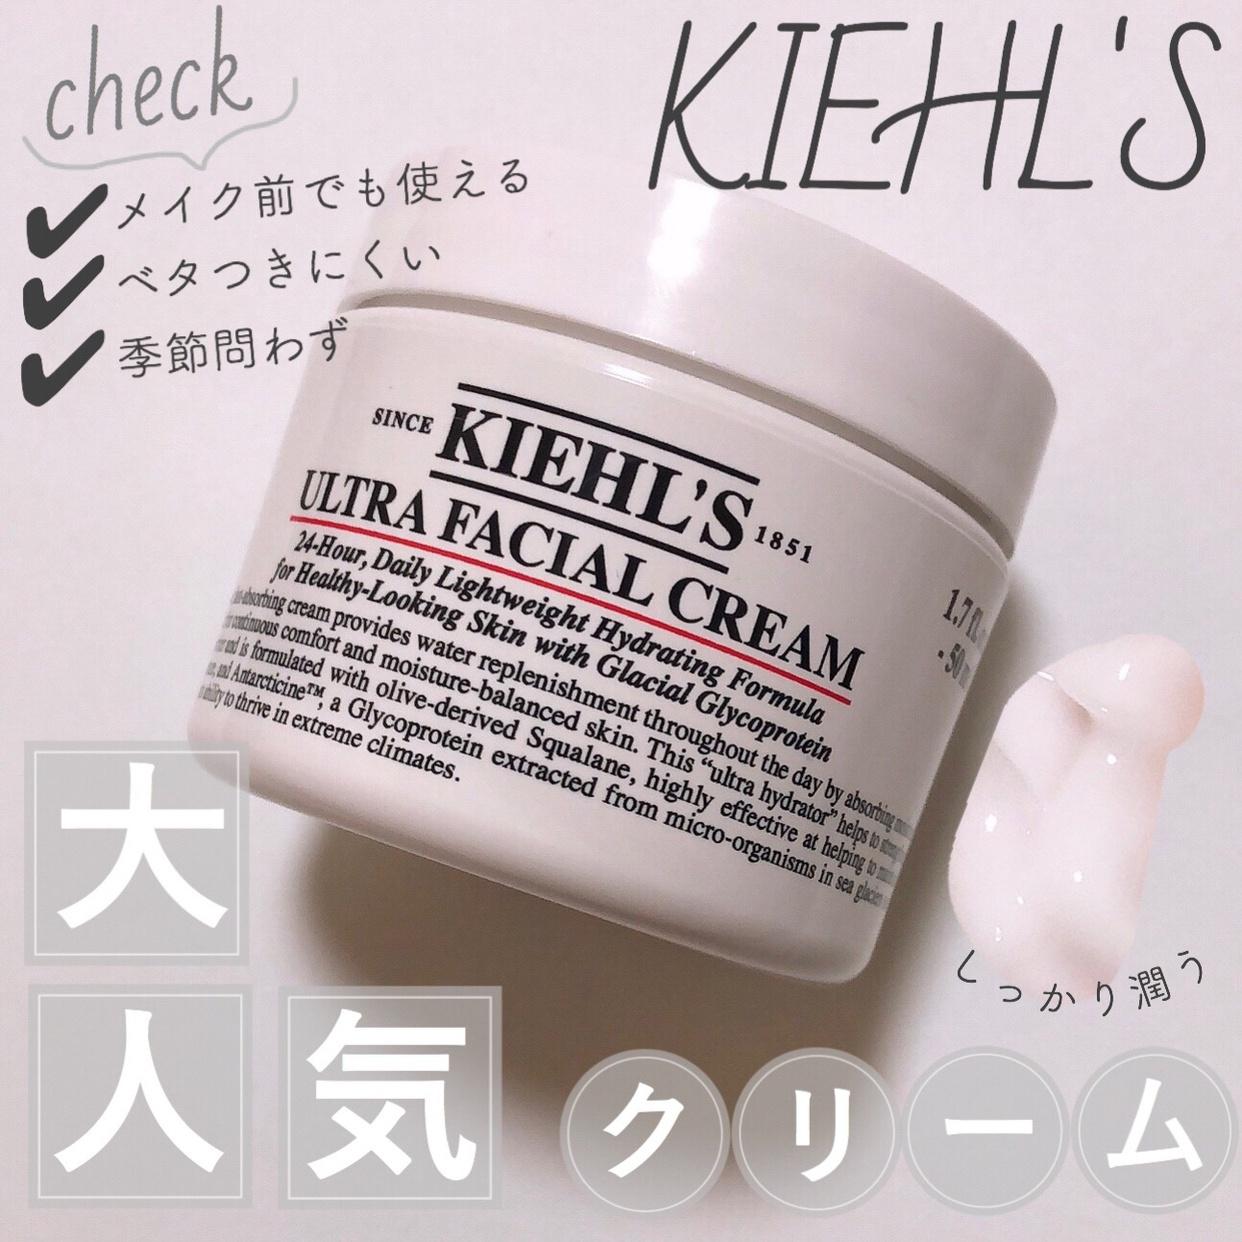 Kiehl's(キールズ) クリーム UFCを使ったmiyu𓂃𓈒𓏸さんのクチコミ画像1